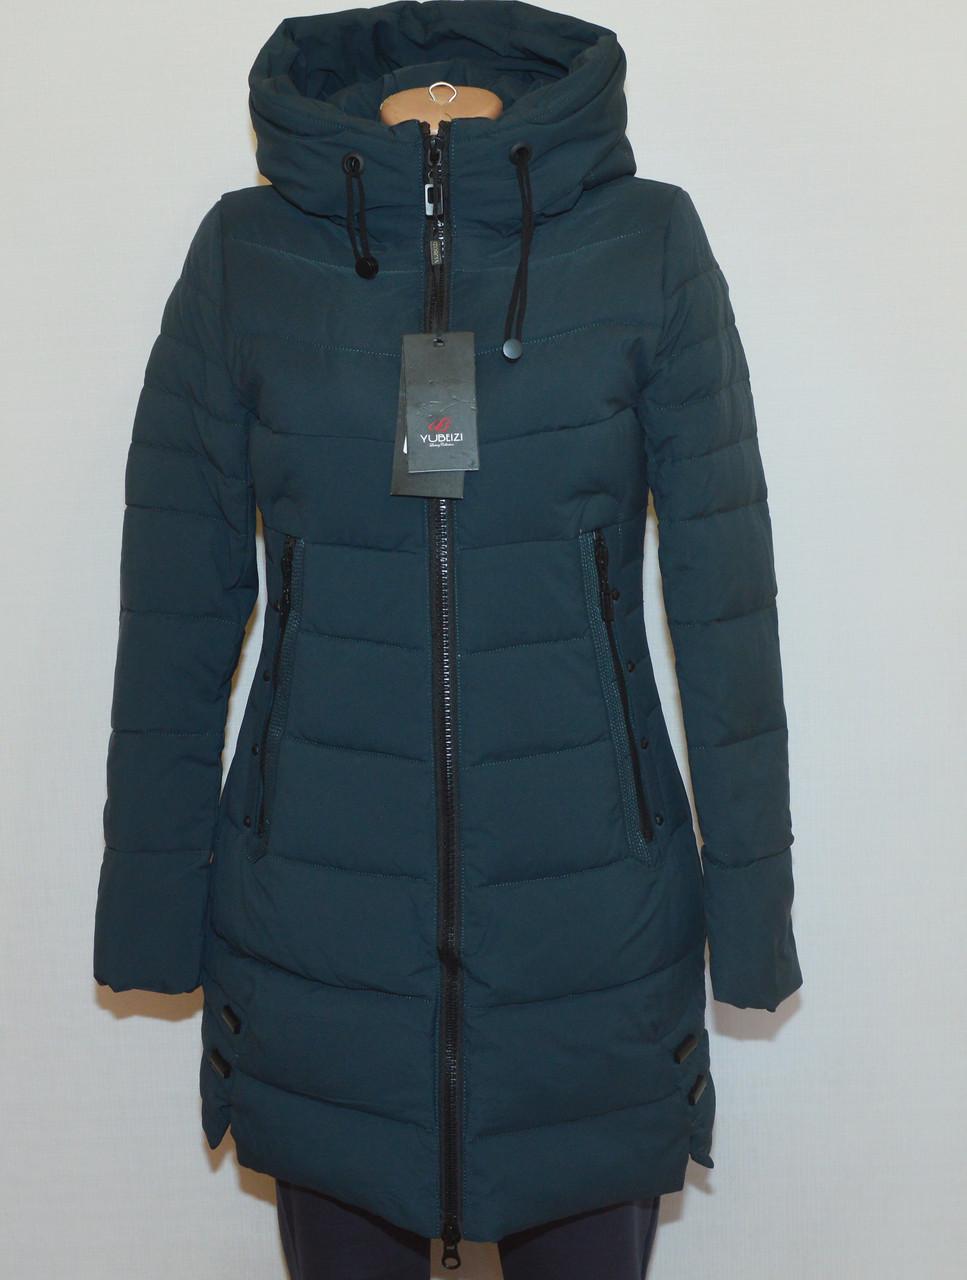 Куртка зимняя приталенная YUBEIZI 9080 (XL)